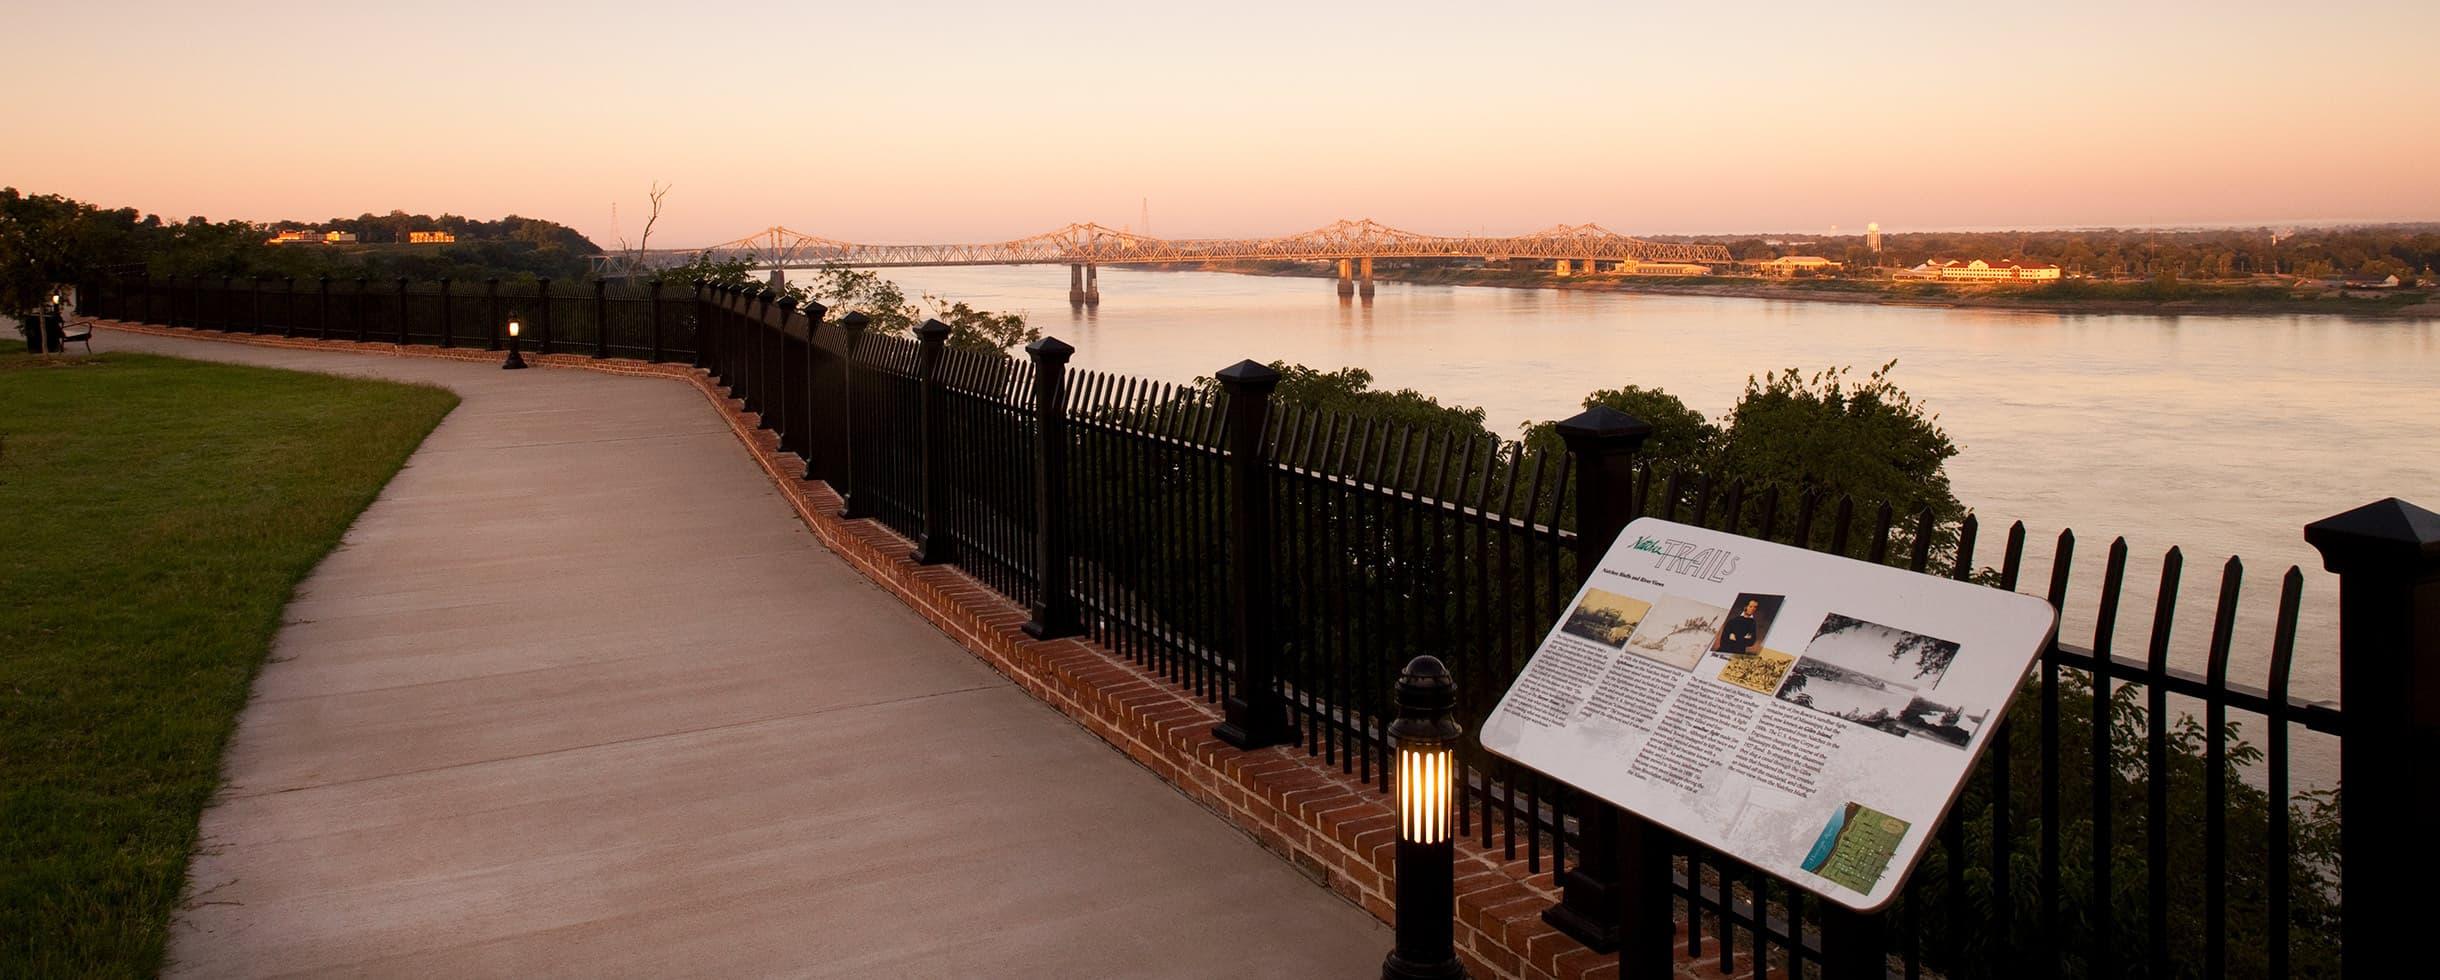 Natchez, MS trail and view of bridge